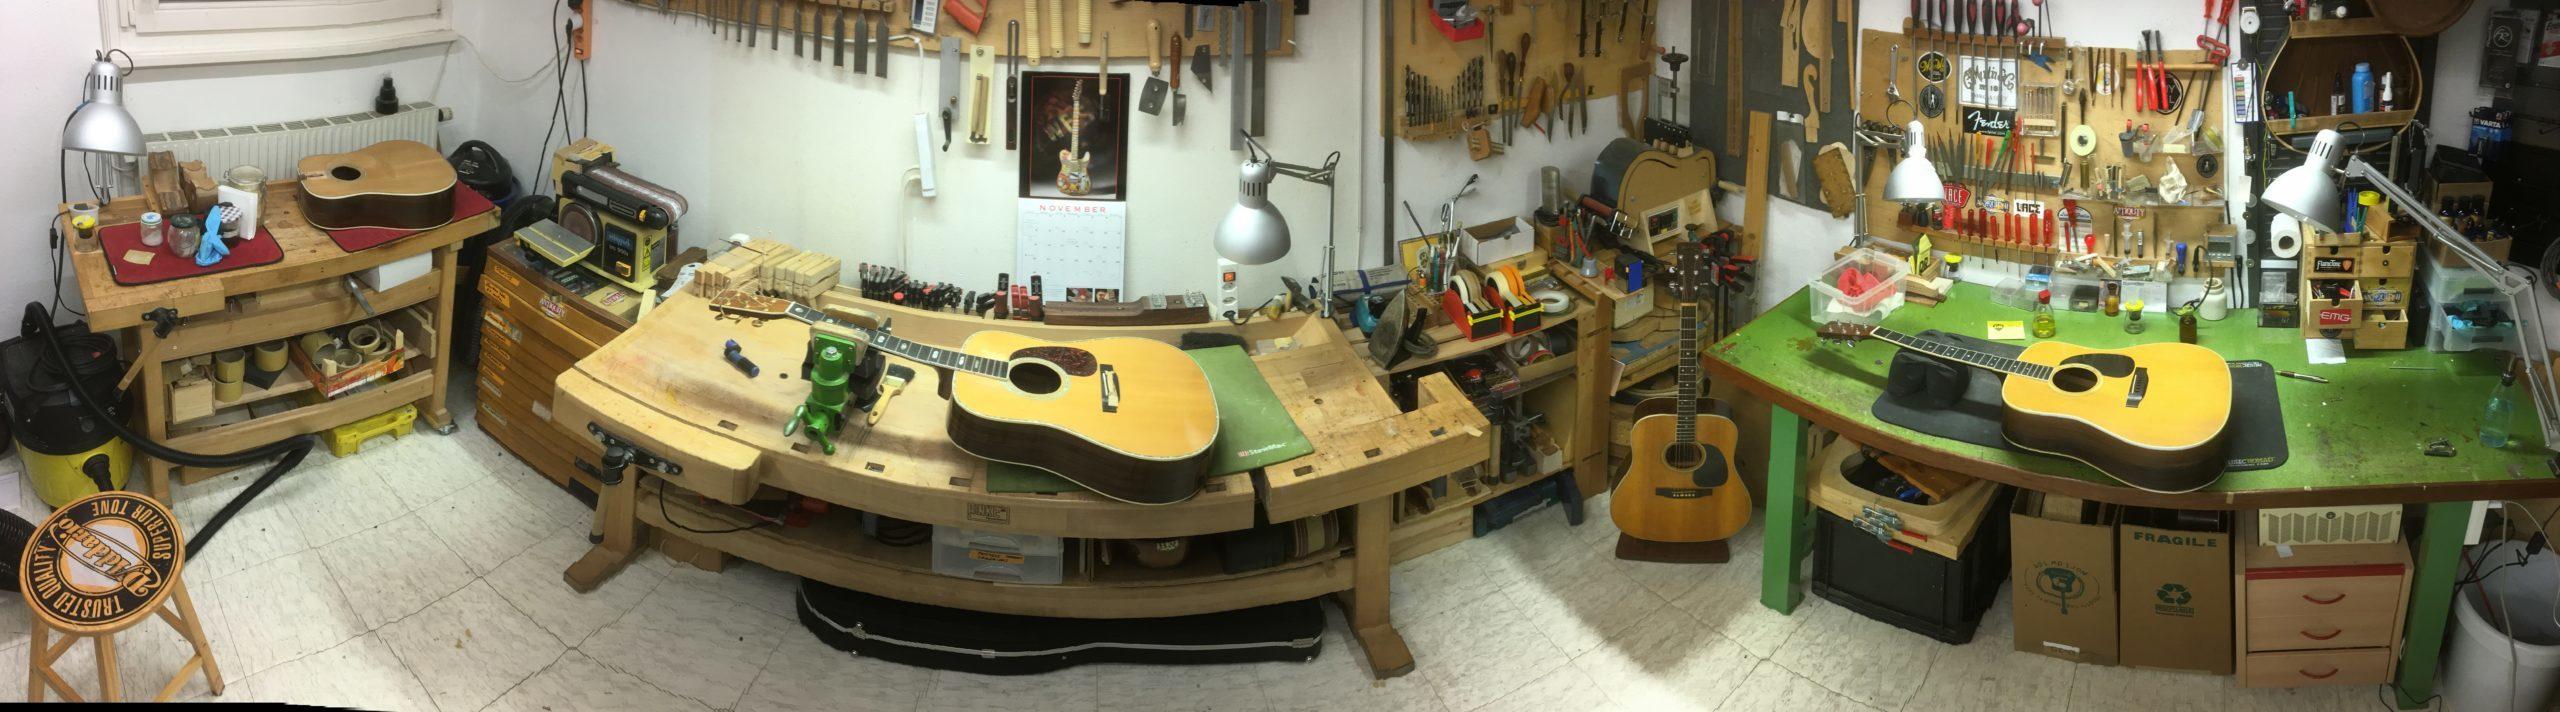 Réparation guitares Martin